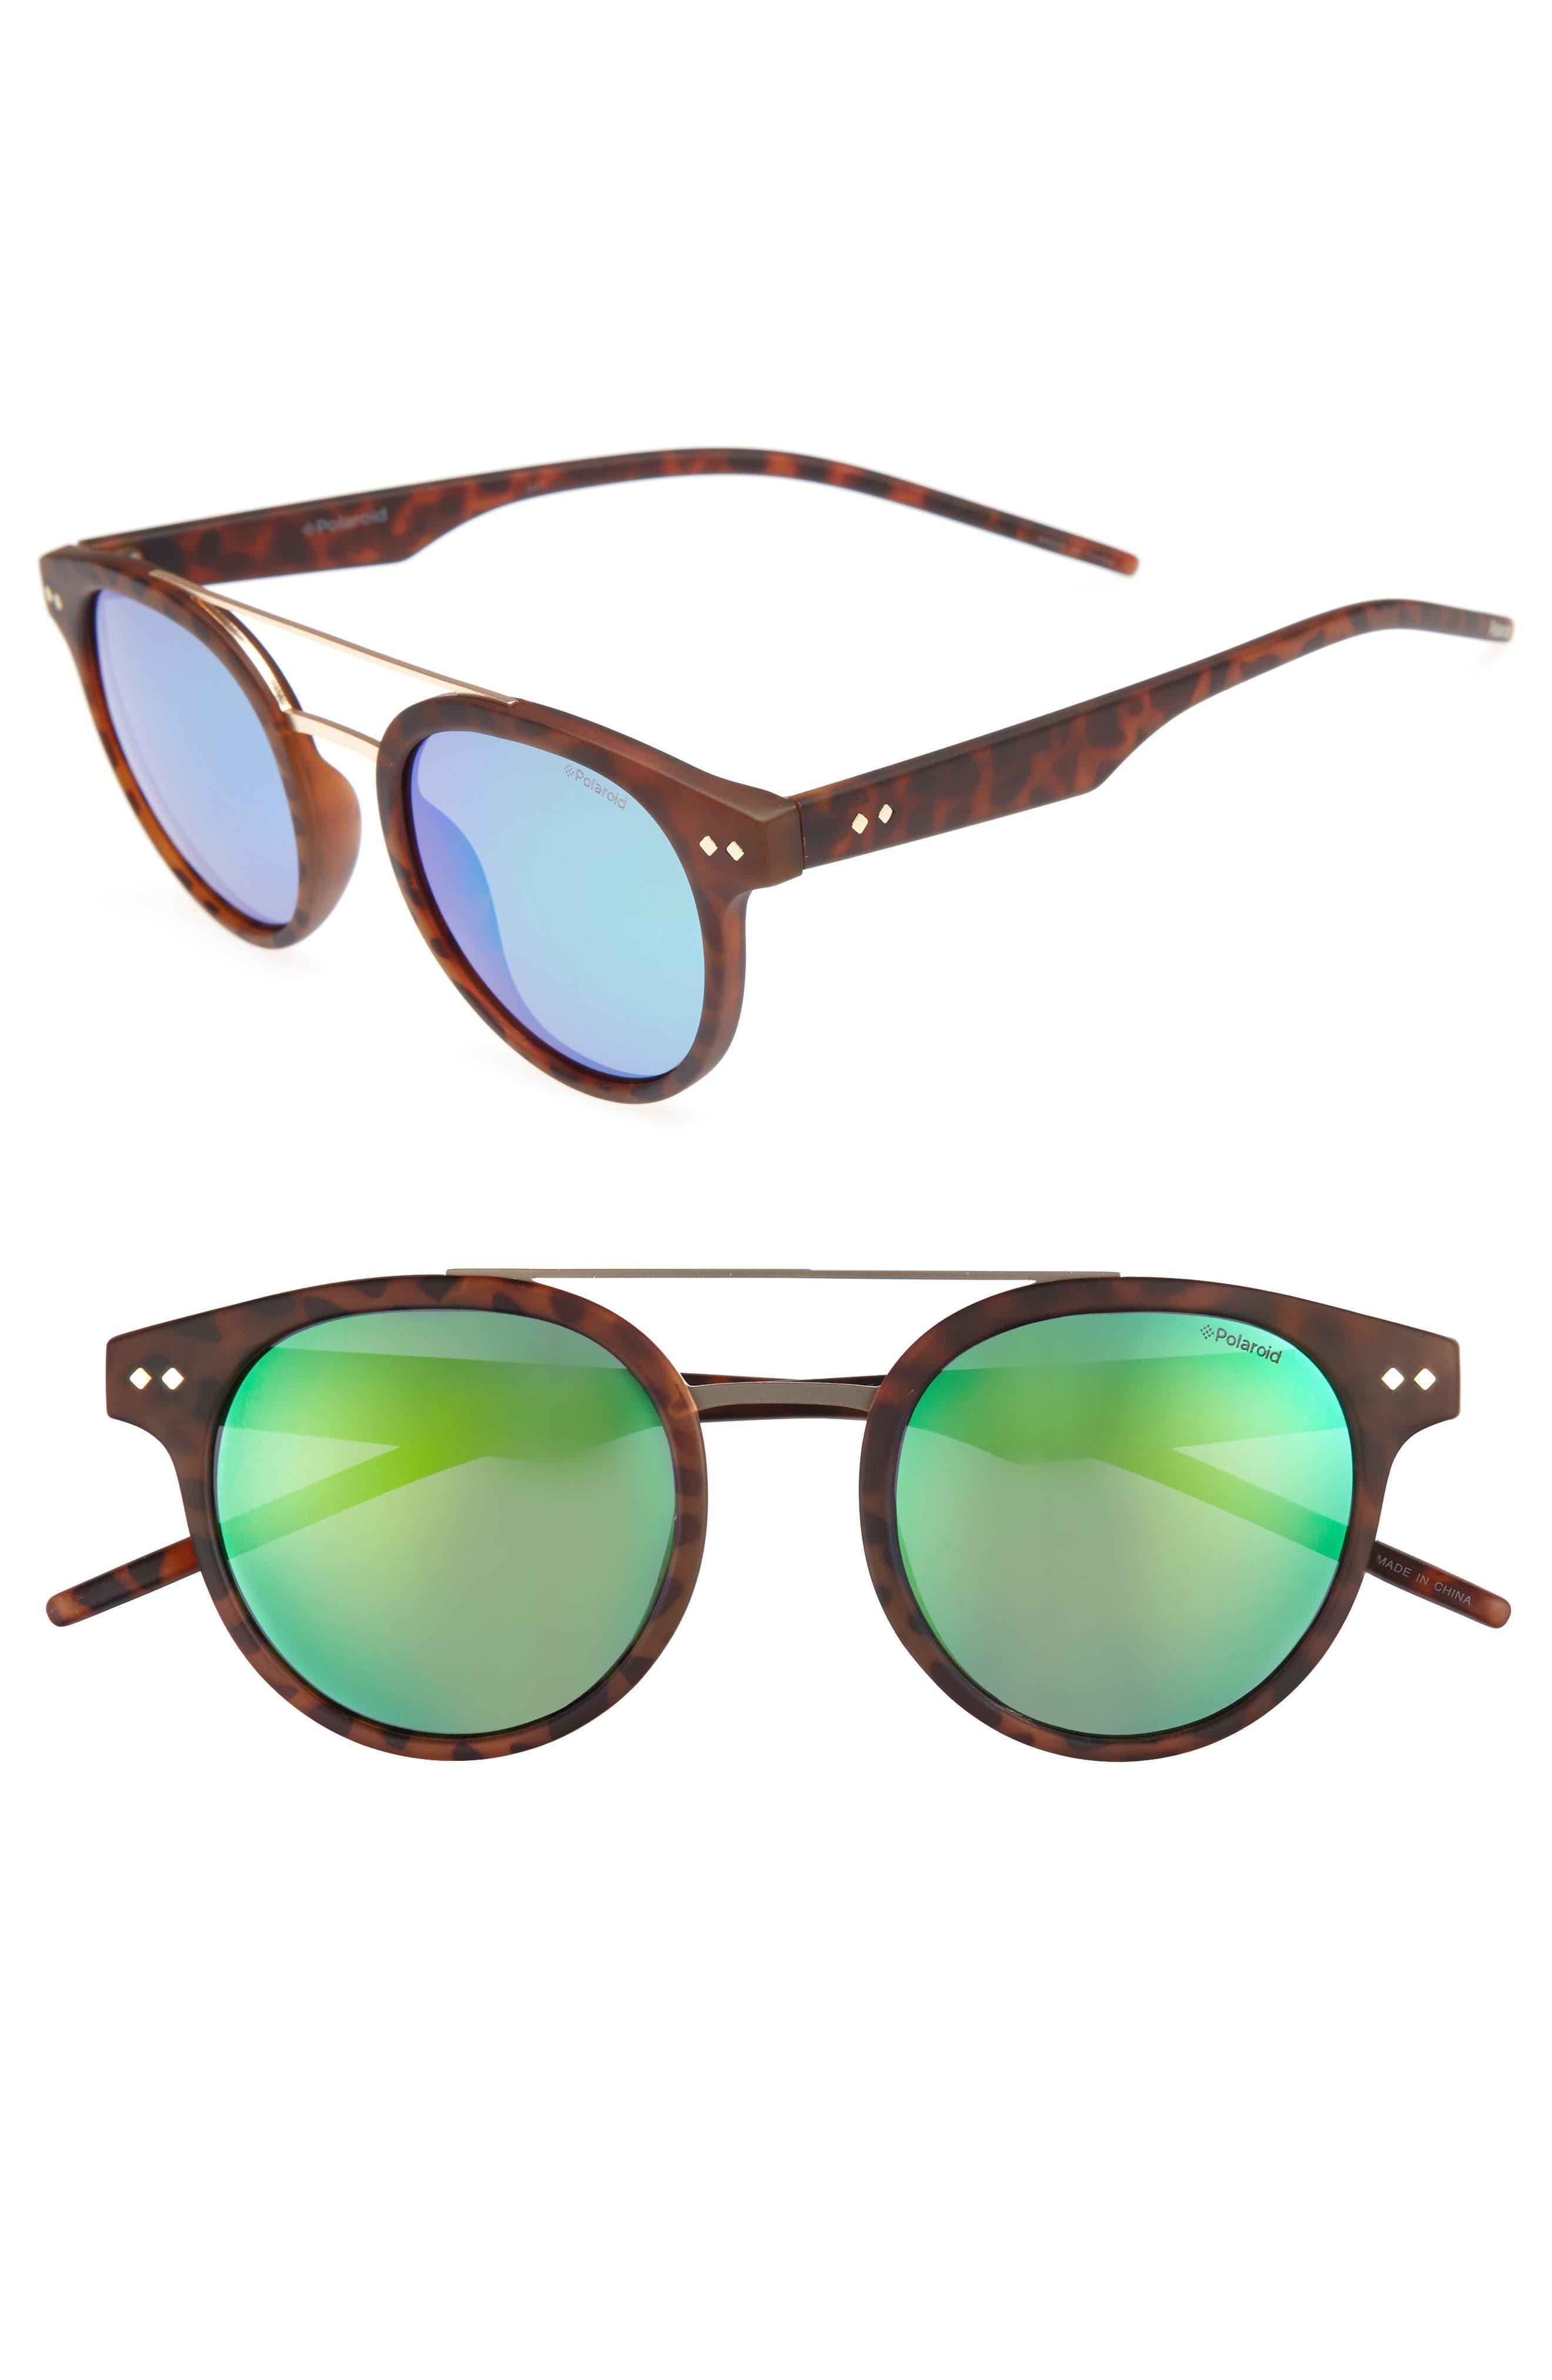 Polaroid 49mm Polarized Retro Sunglasses